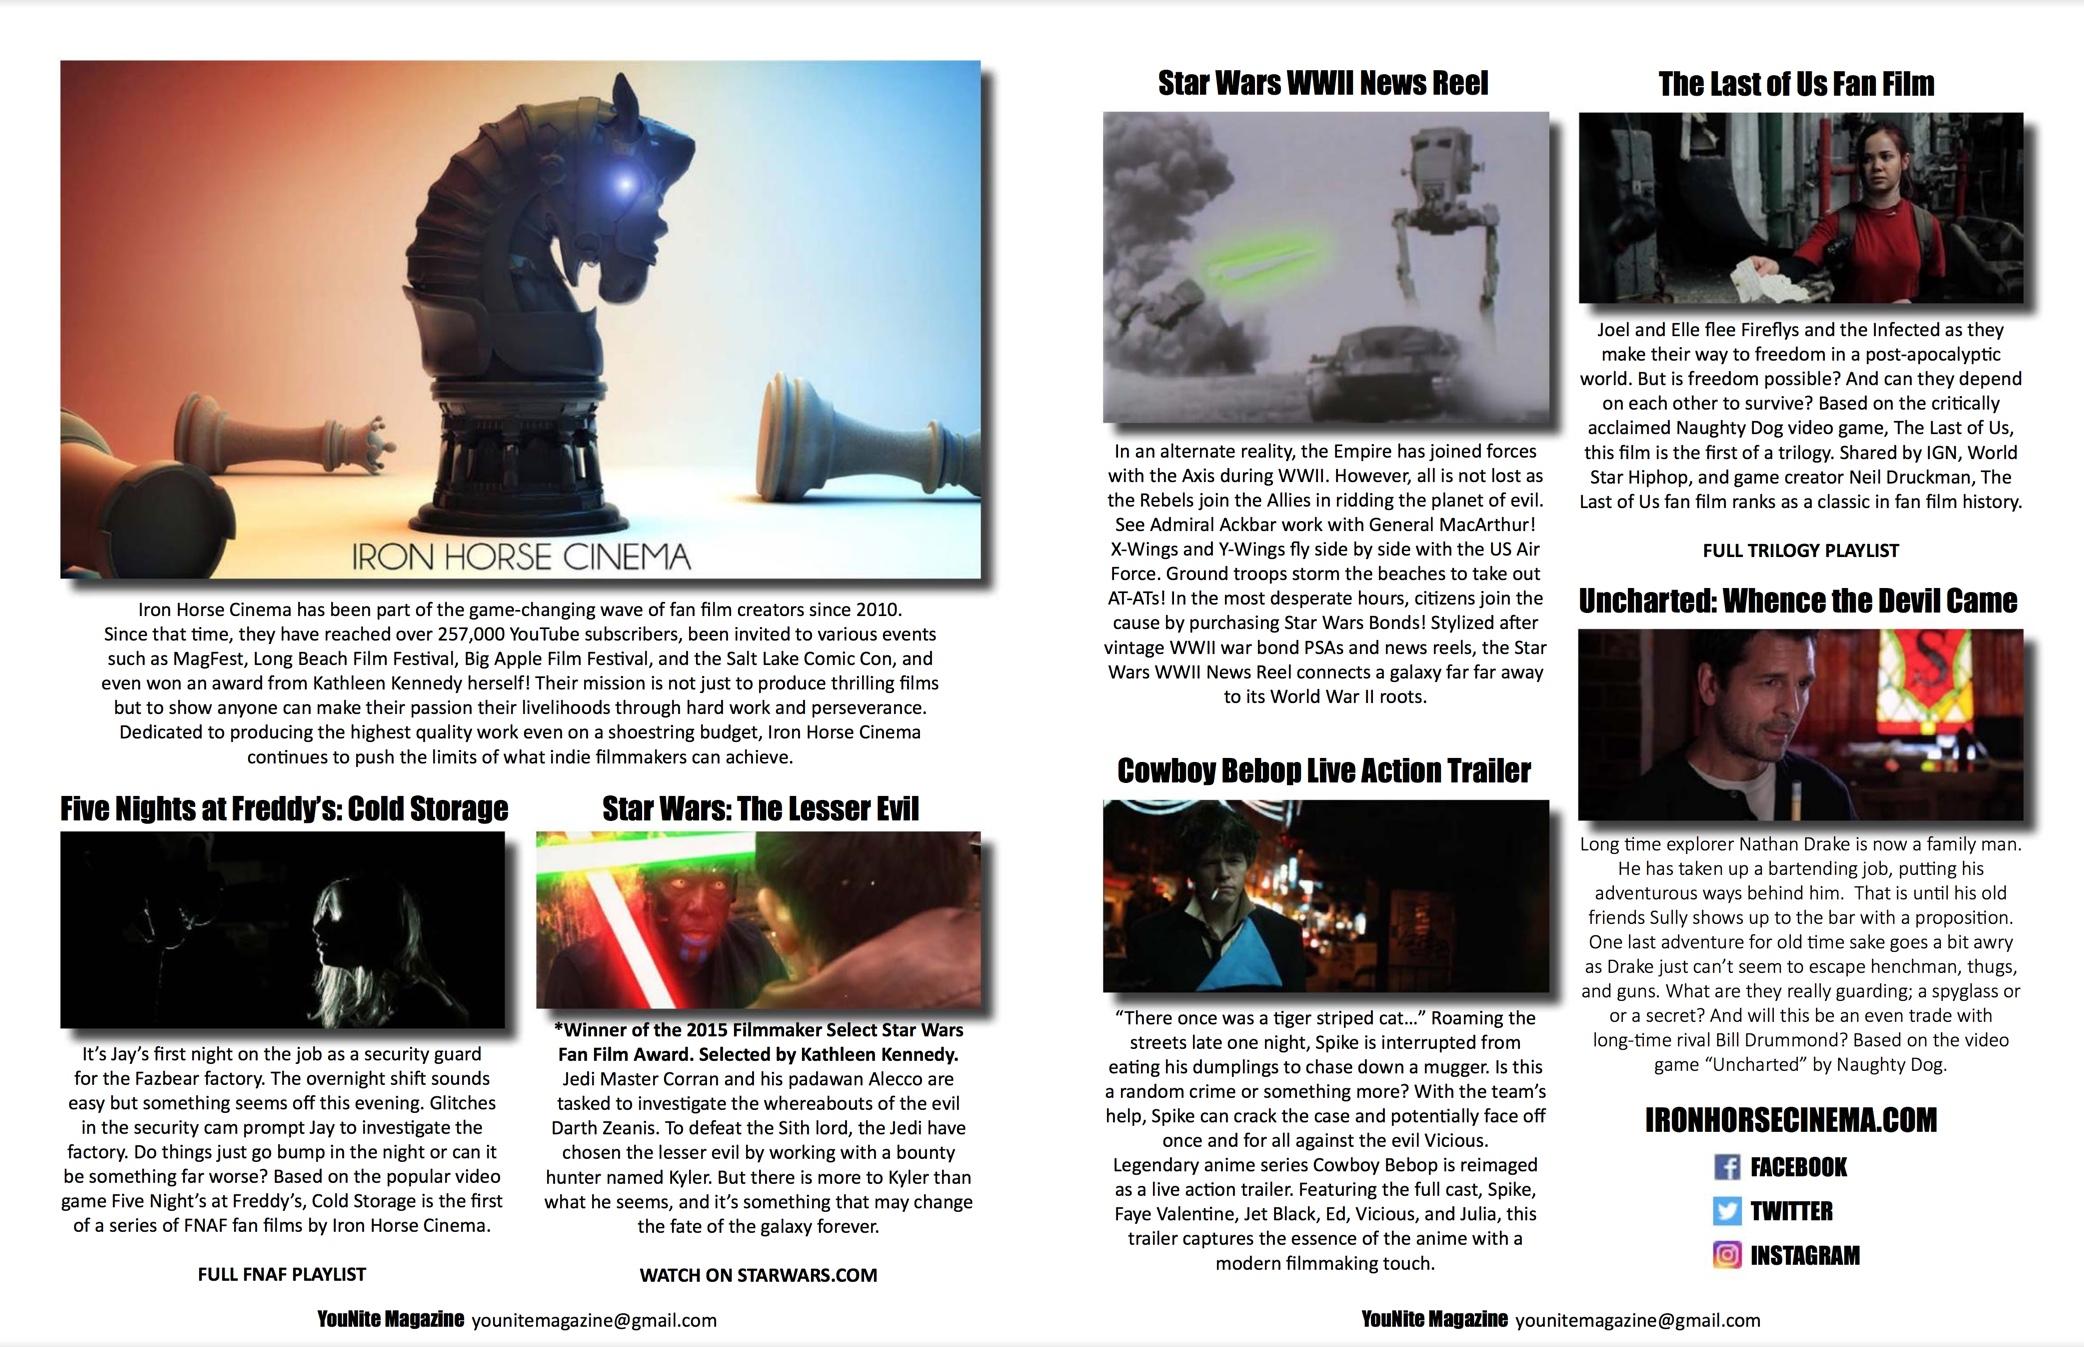 YouNite Magazine - Write up in the premiere issue of YouNite Magazine.